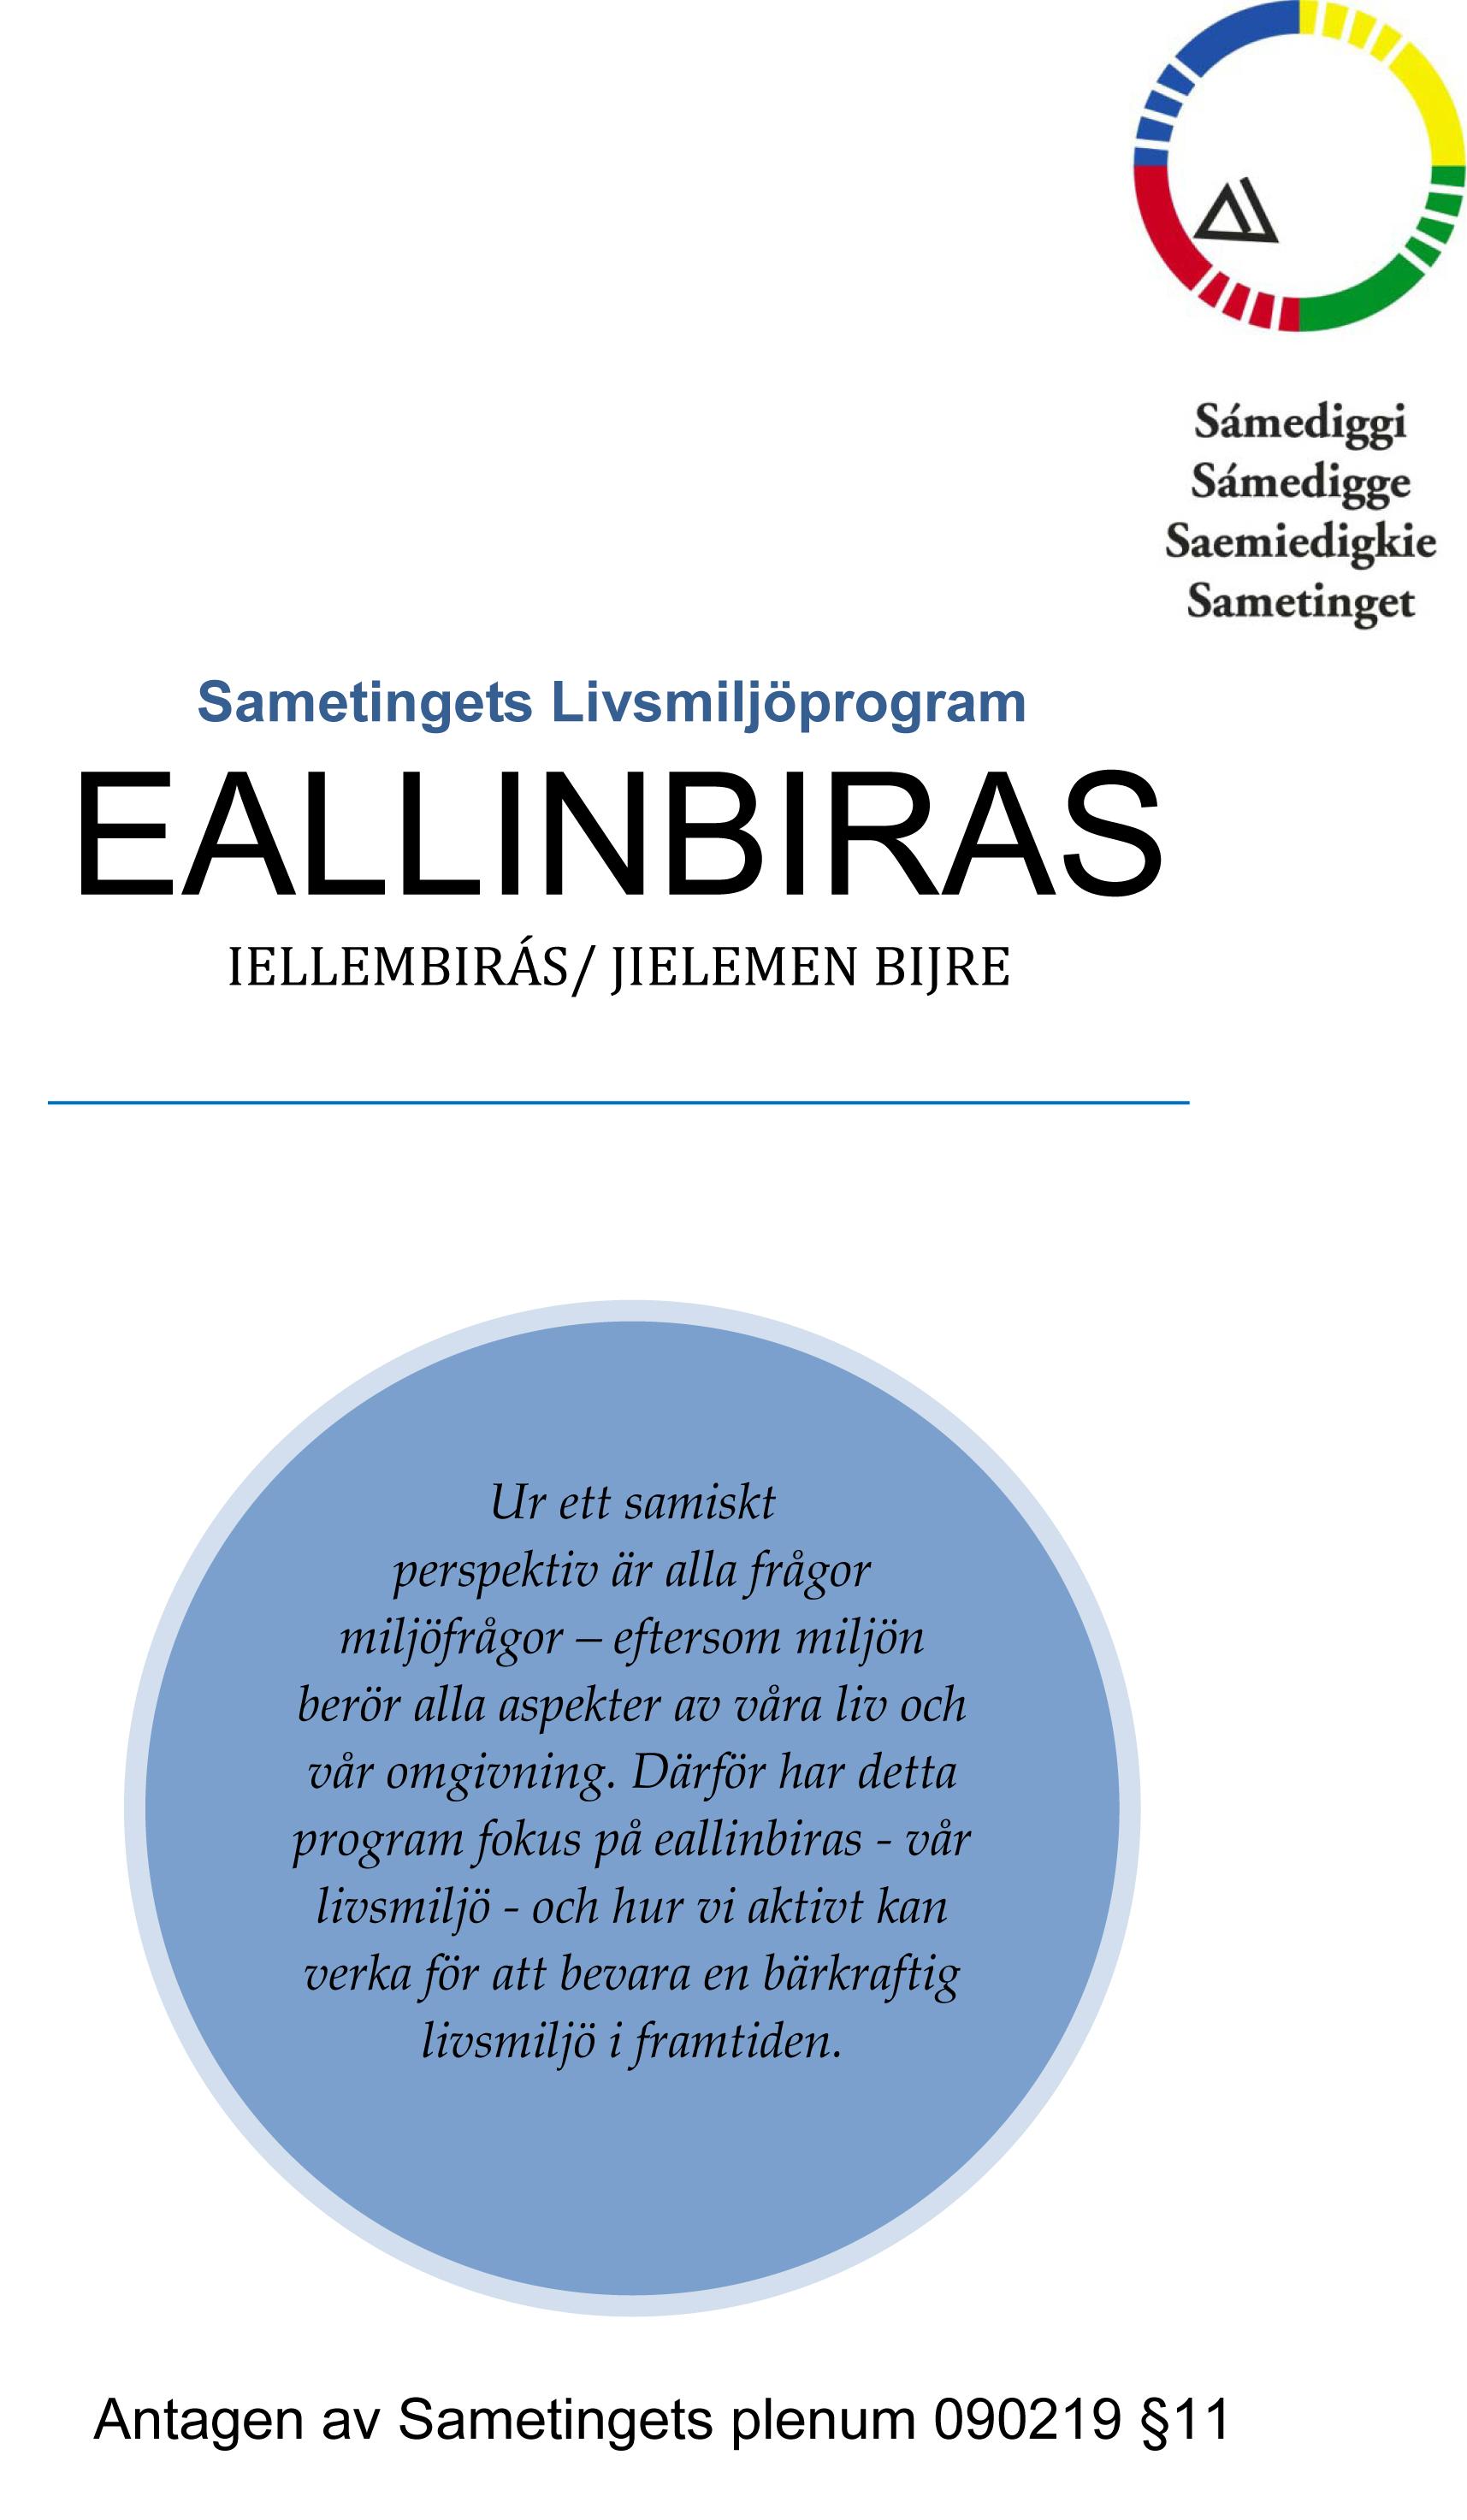 Eallinbiras